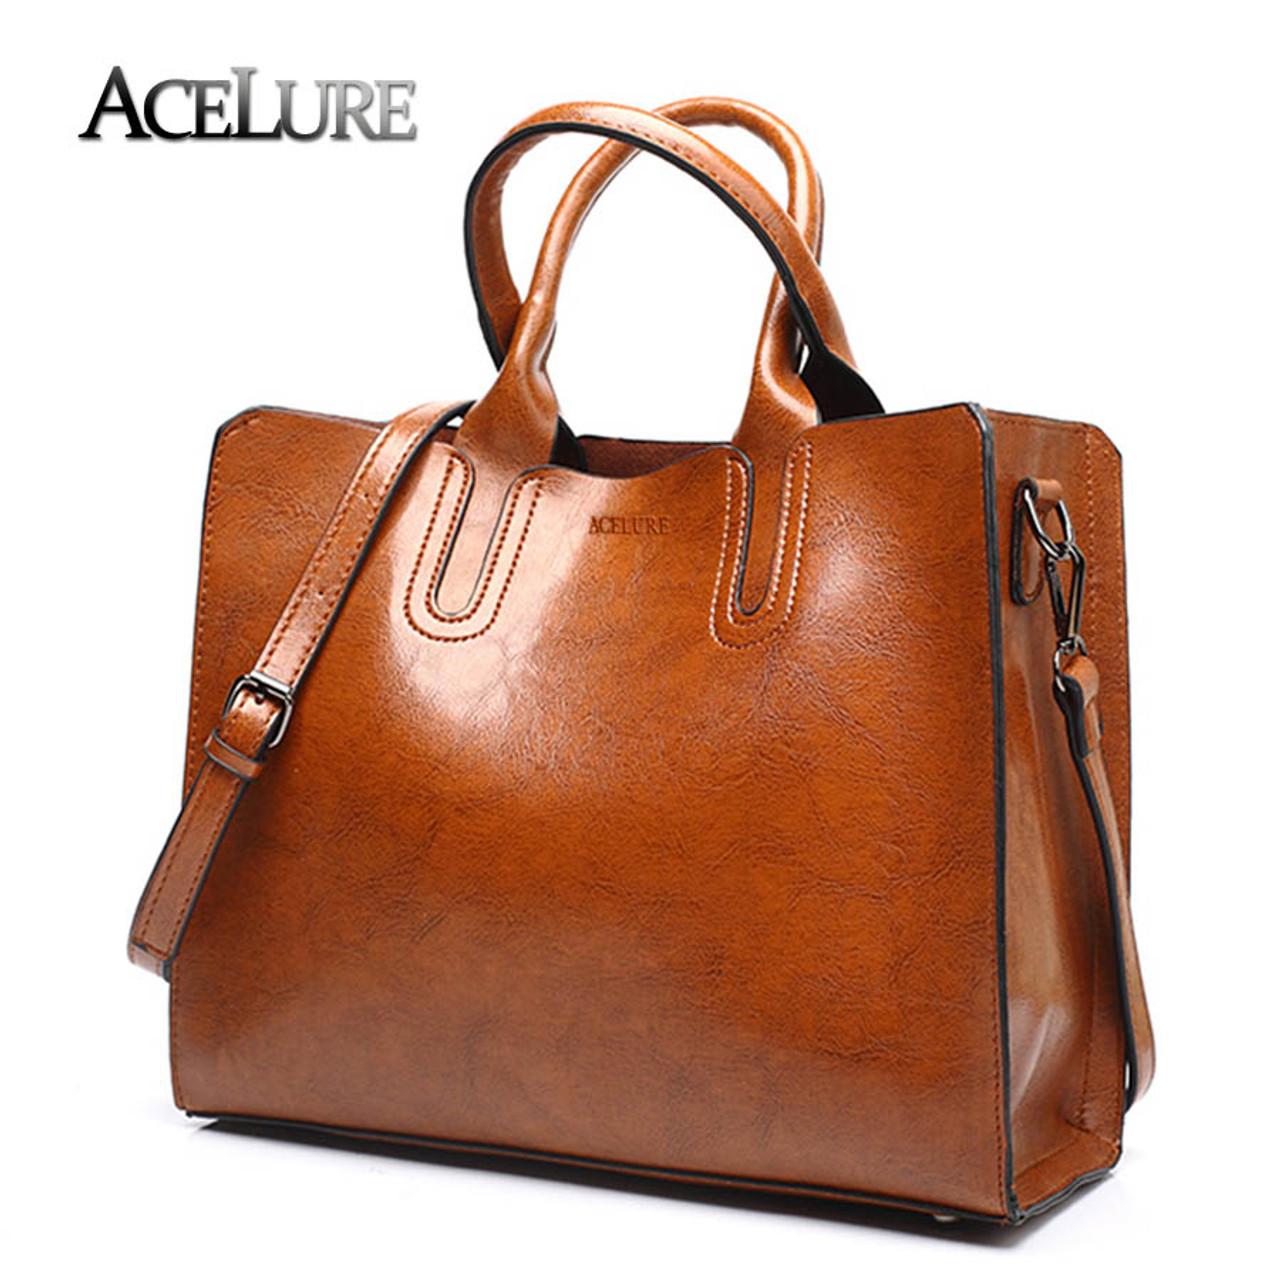 2578c3dec048 ACELURE Leather Handbags Big Women Bag High Quality Casual Female Bags  Trunk Tote Spanish Brand Shoulder Bag Ladies Large Bolsos - OnshopDeals.Com